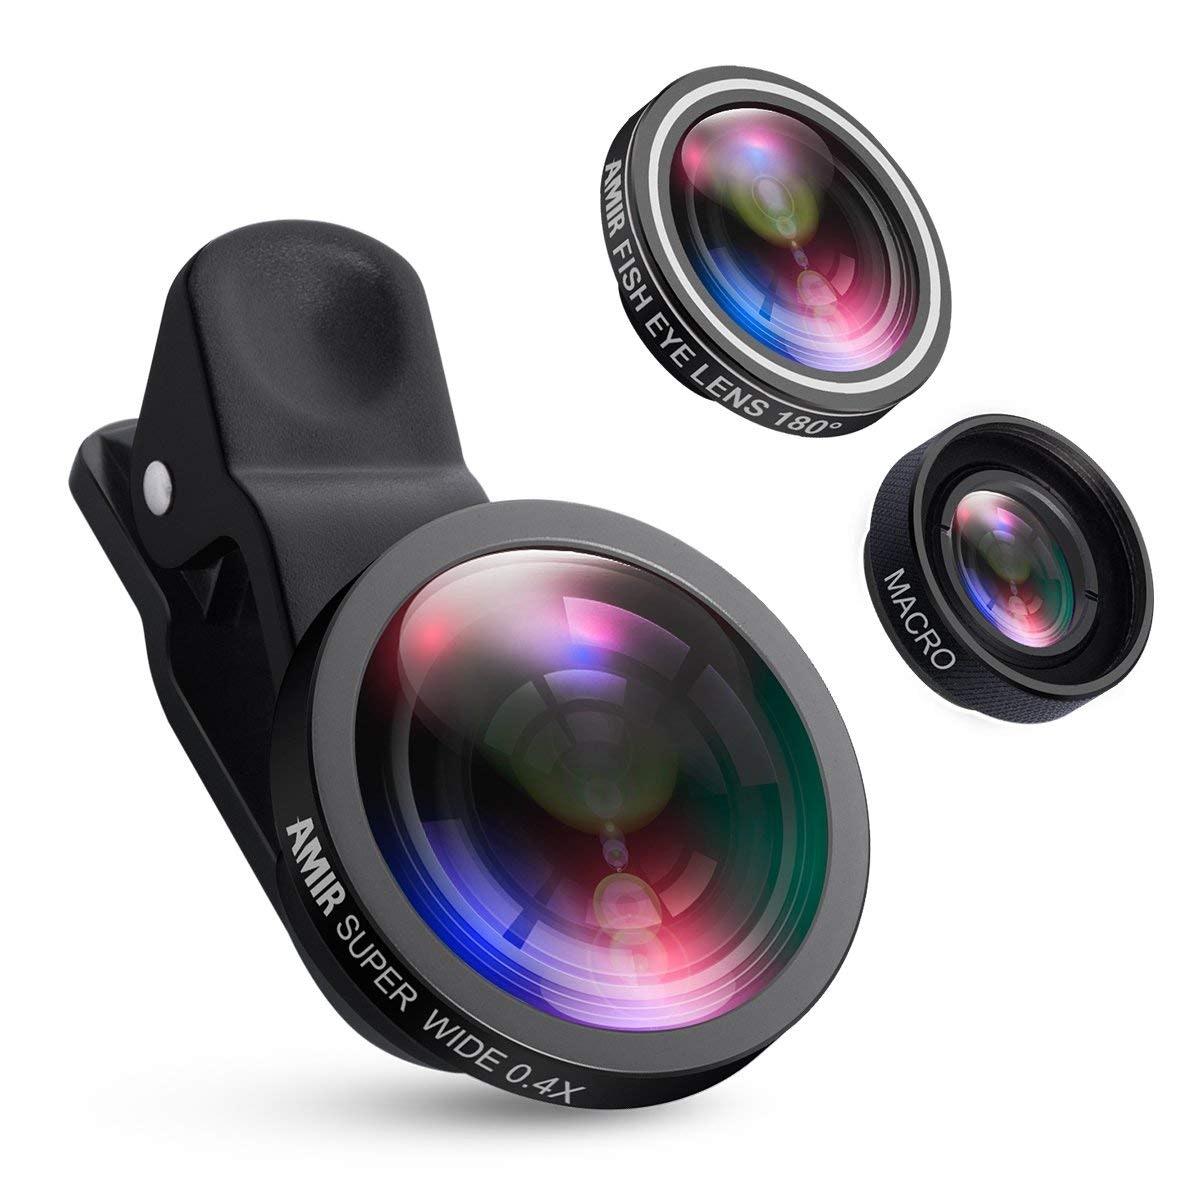 Amir For iPhone Lens Kit